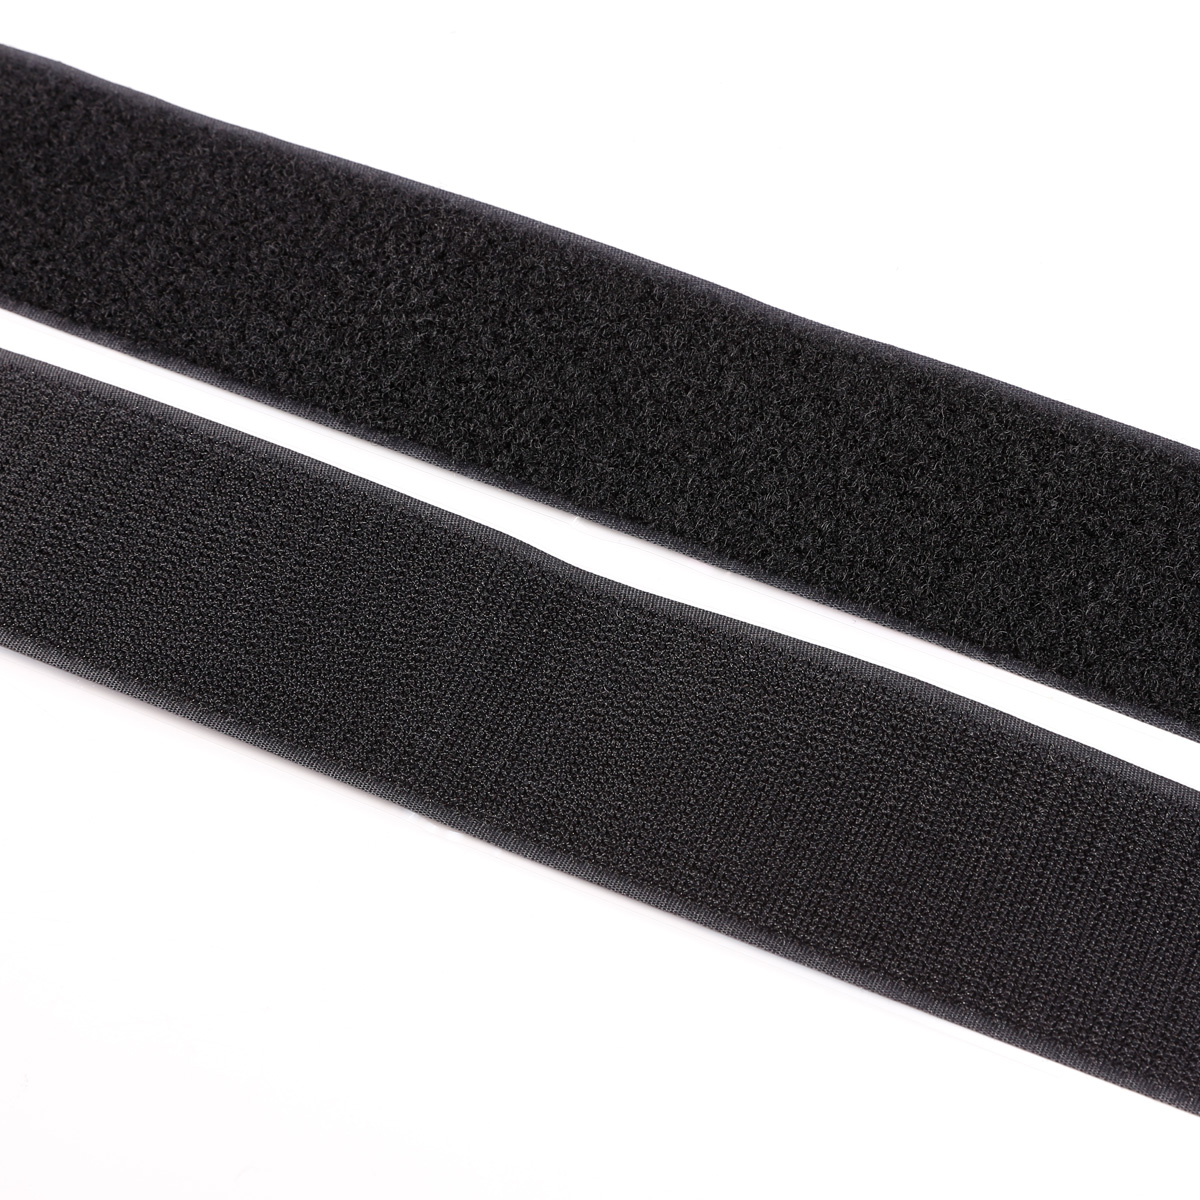 klettband breit great vergrern with klettband breit amazing klettband mm breit with klettband. Black Bedroom Furniture Sets. Home Design Ideas